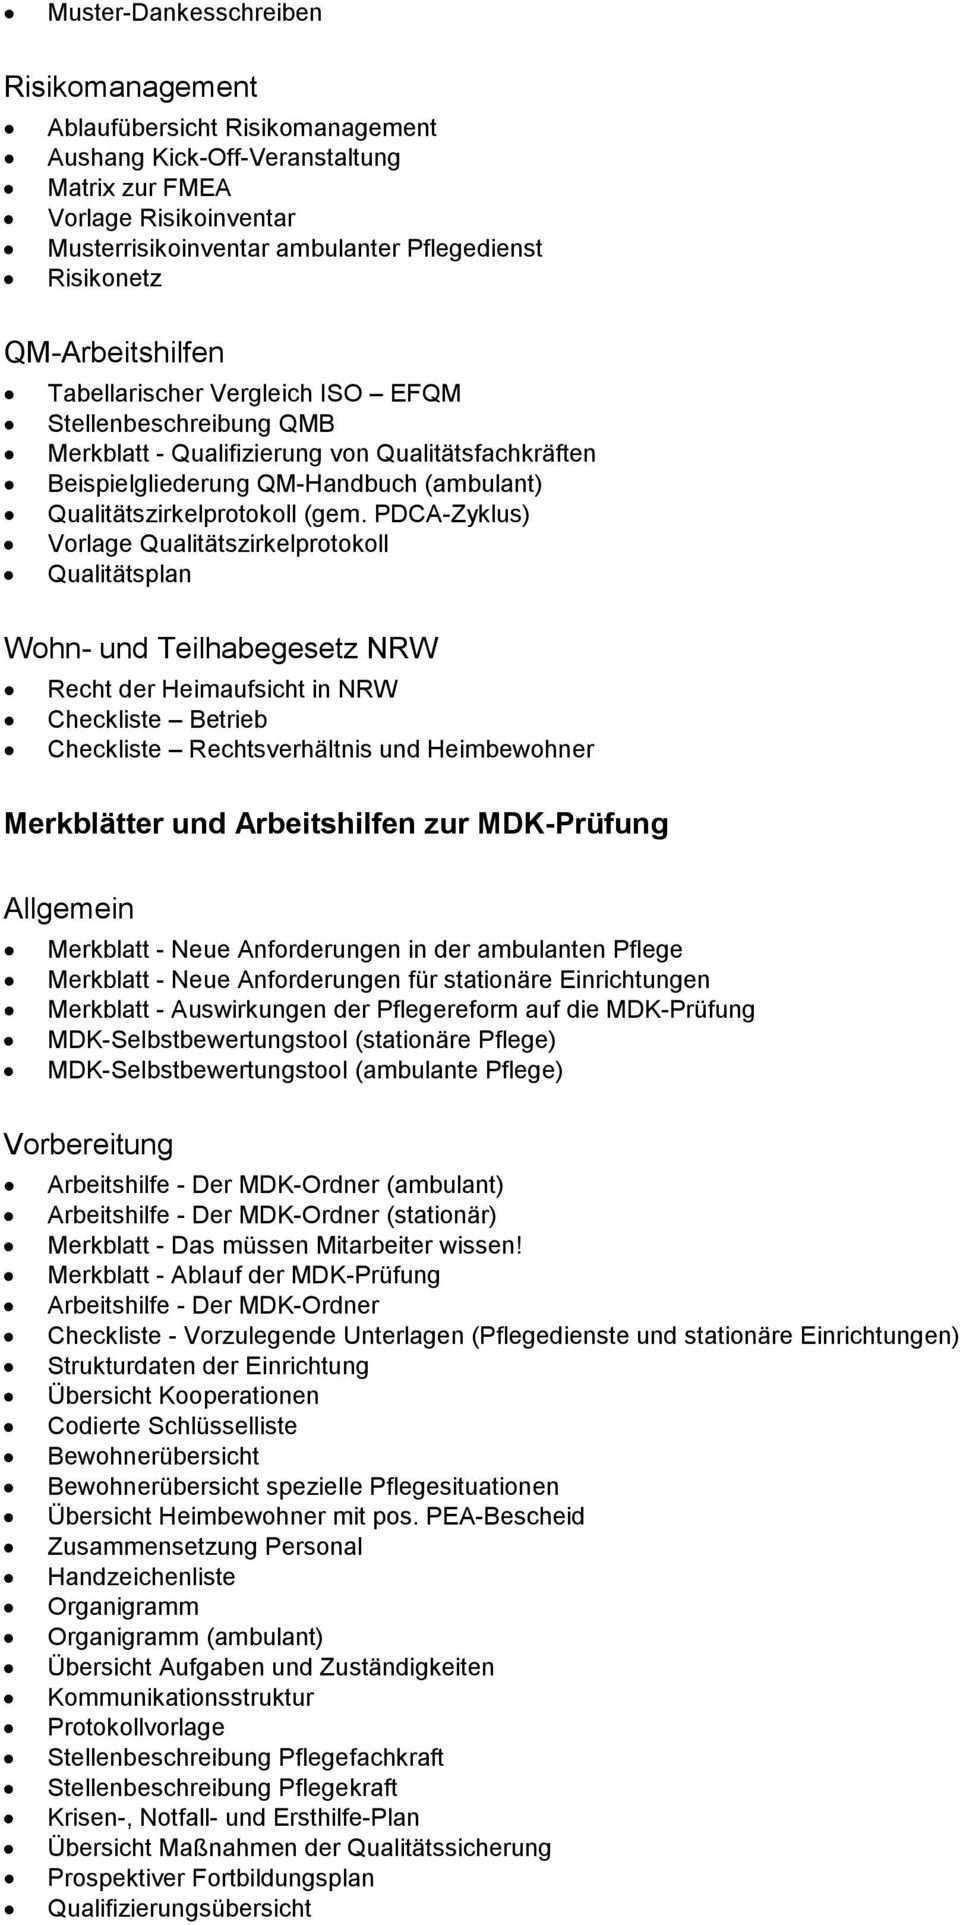 Die Neue Mdk Prufanleitung Pdf Free Download